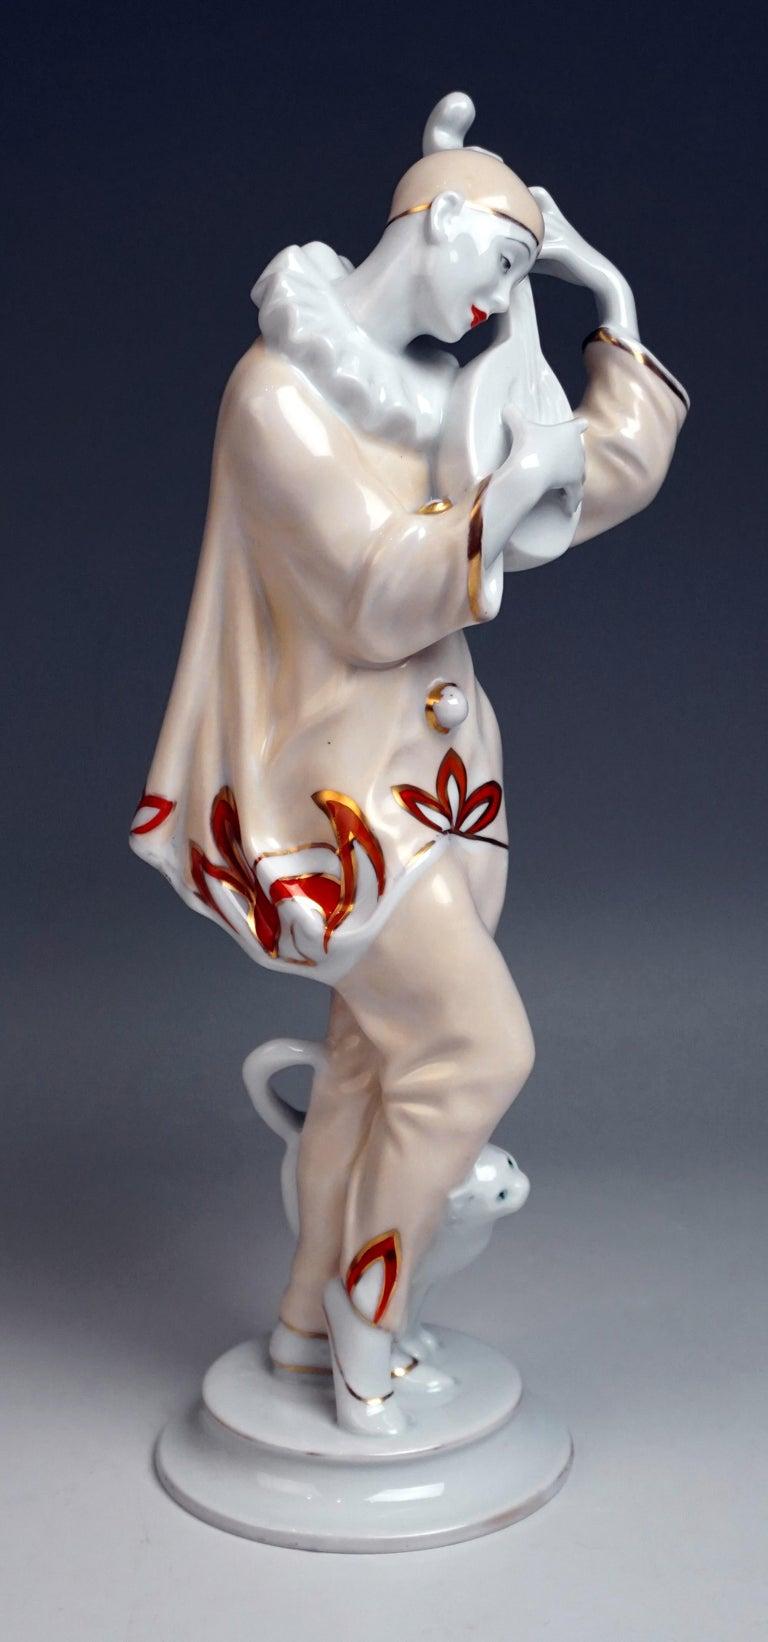 Glazed Rosenthal Art Déco Figurine Pierrot 'Ash Wednesday' Max Valentin Germany, 1922 For Sale